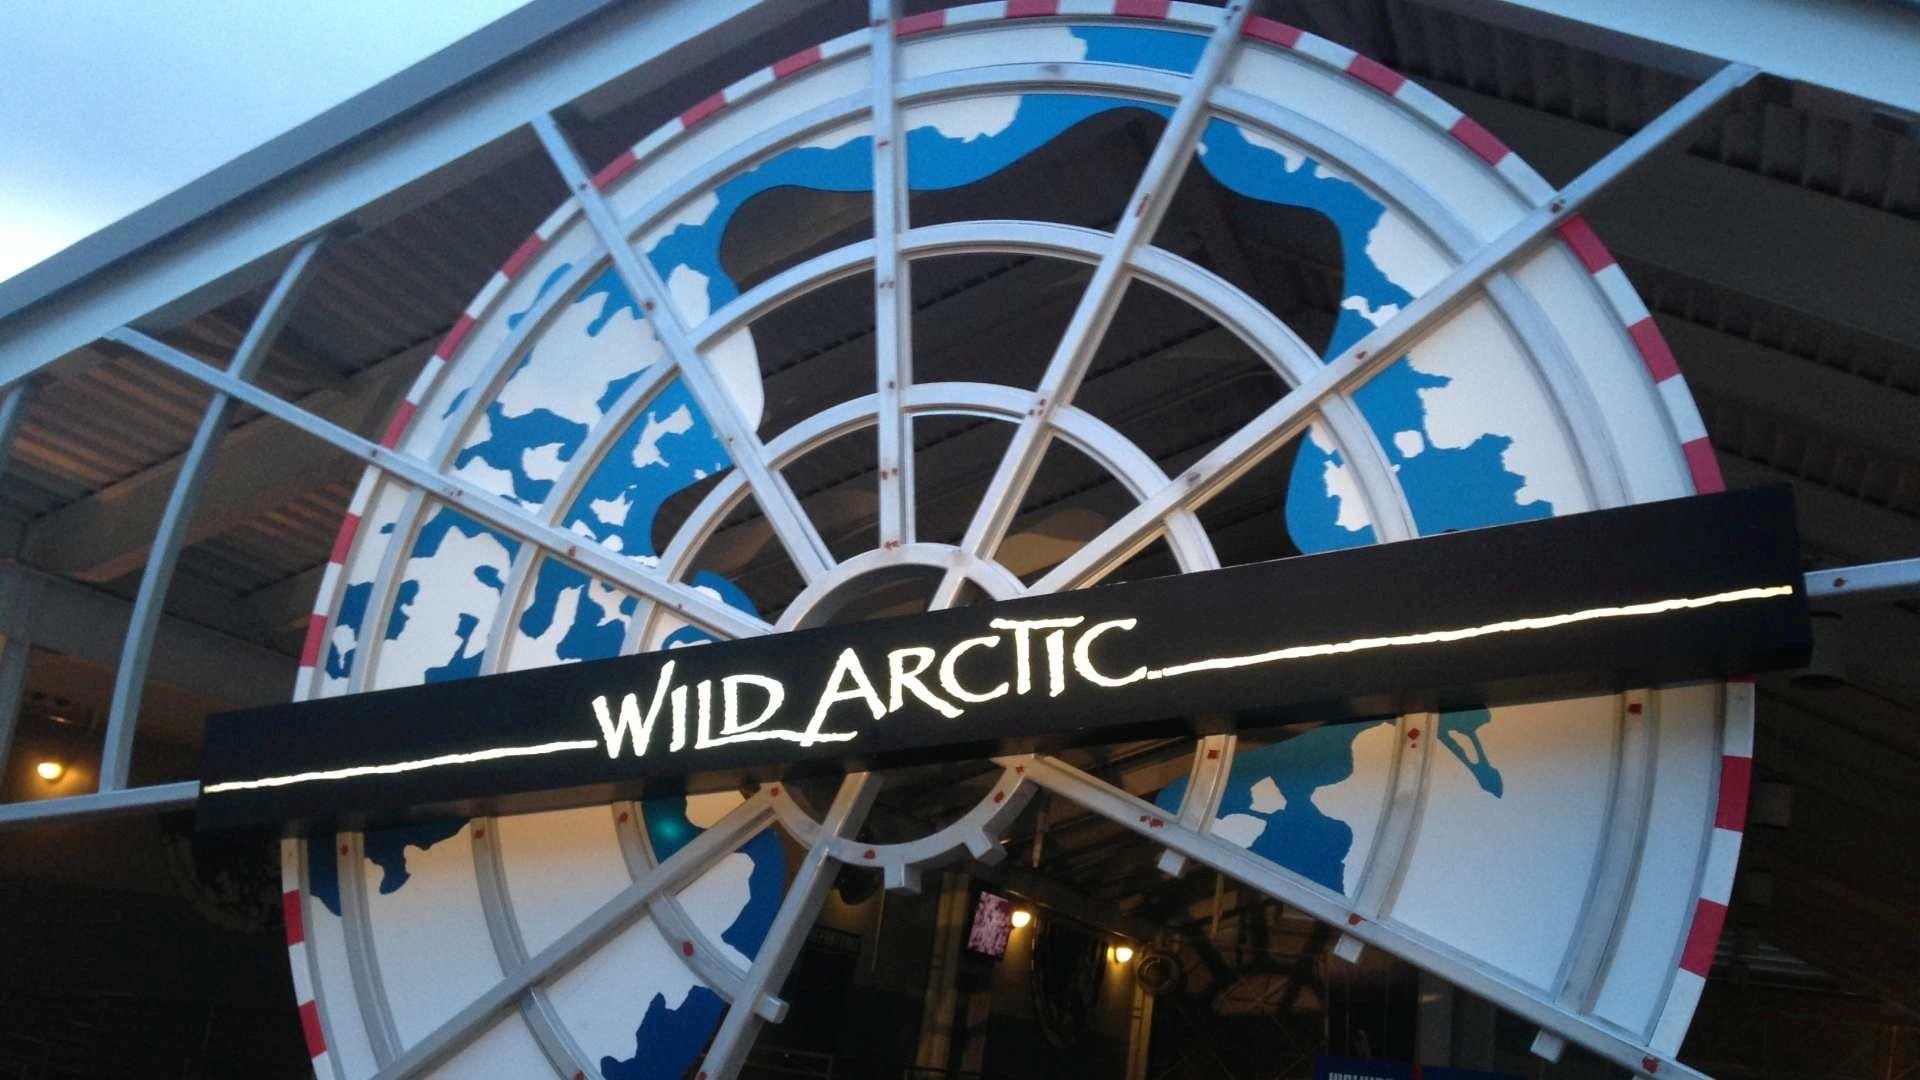 Sea World Wild Artic - Painting